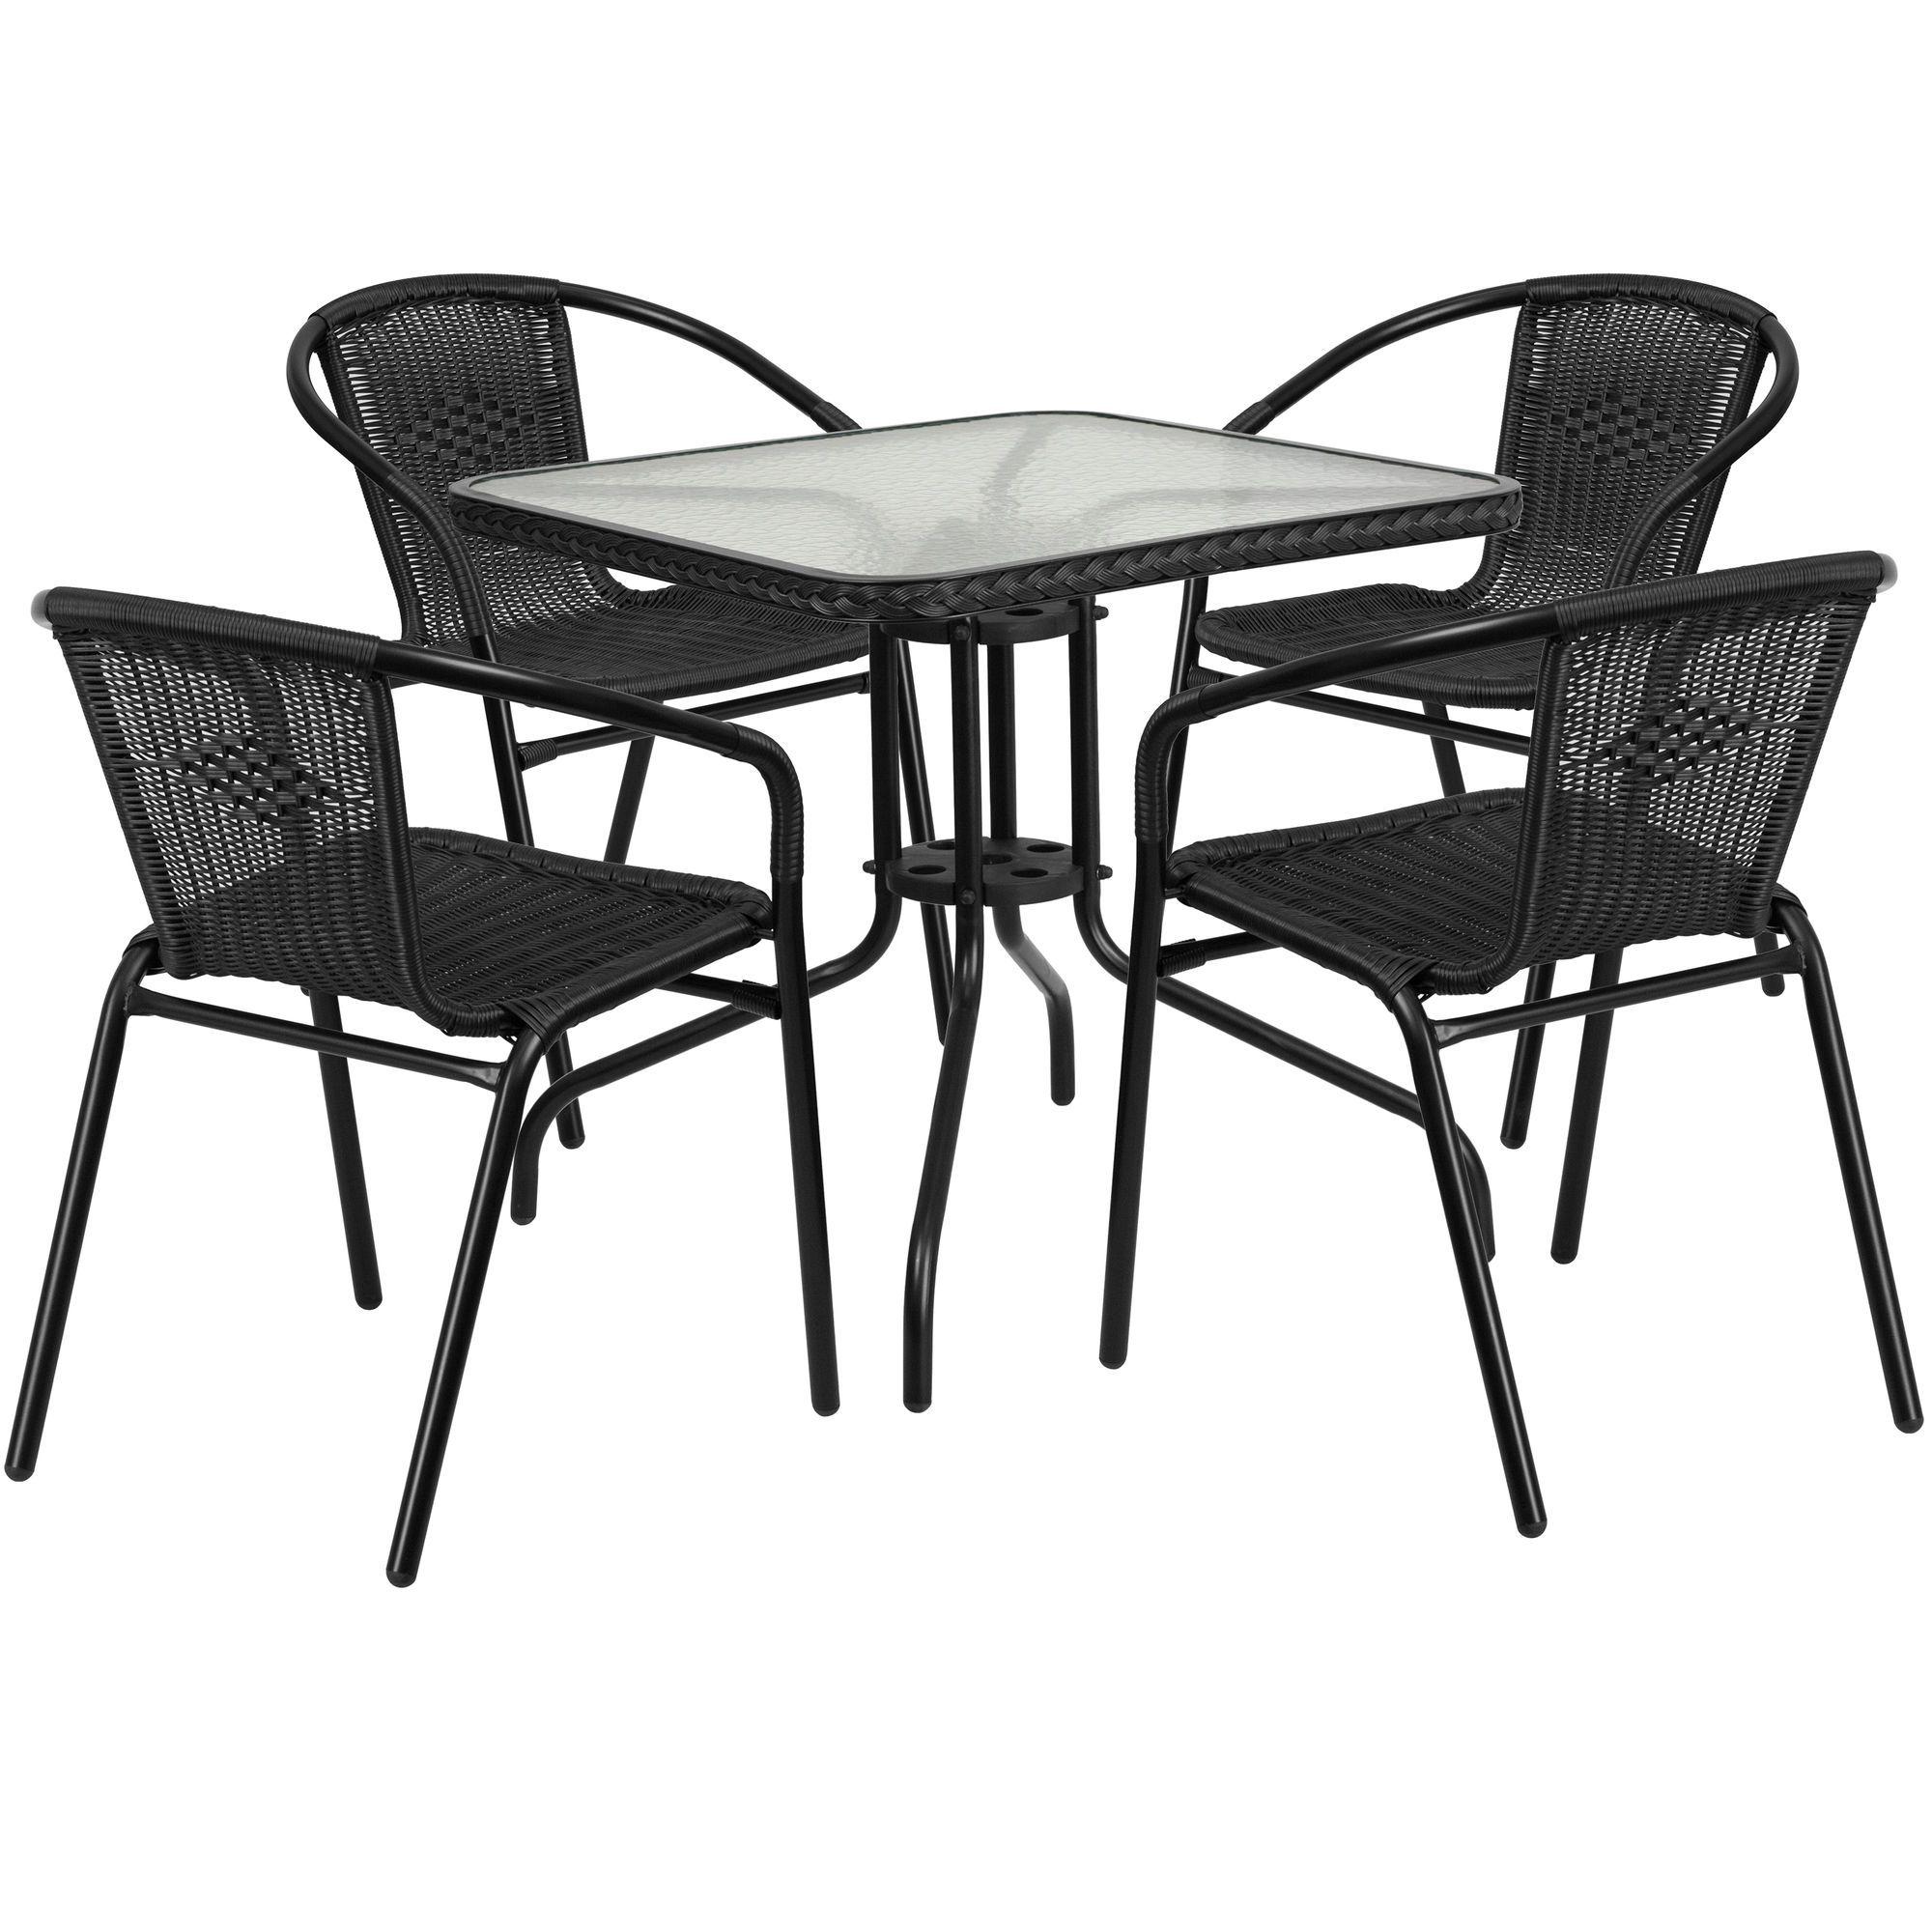 flash furniture aluminum and rattan commercial indoor-outdoor restaurant stack chair